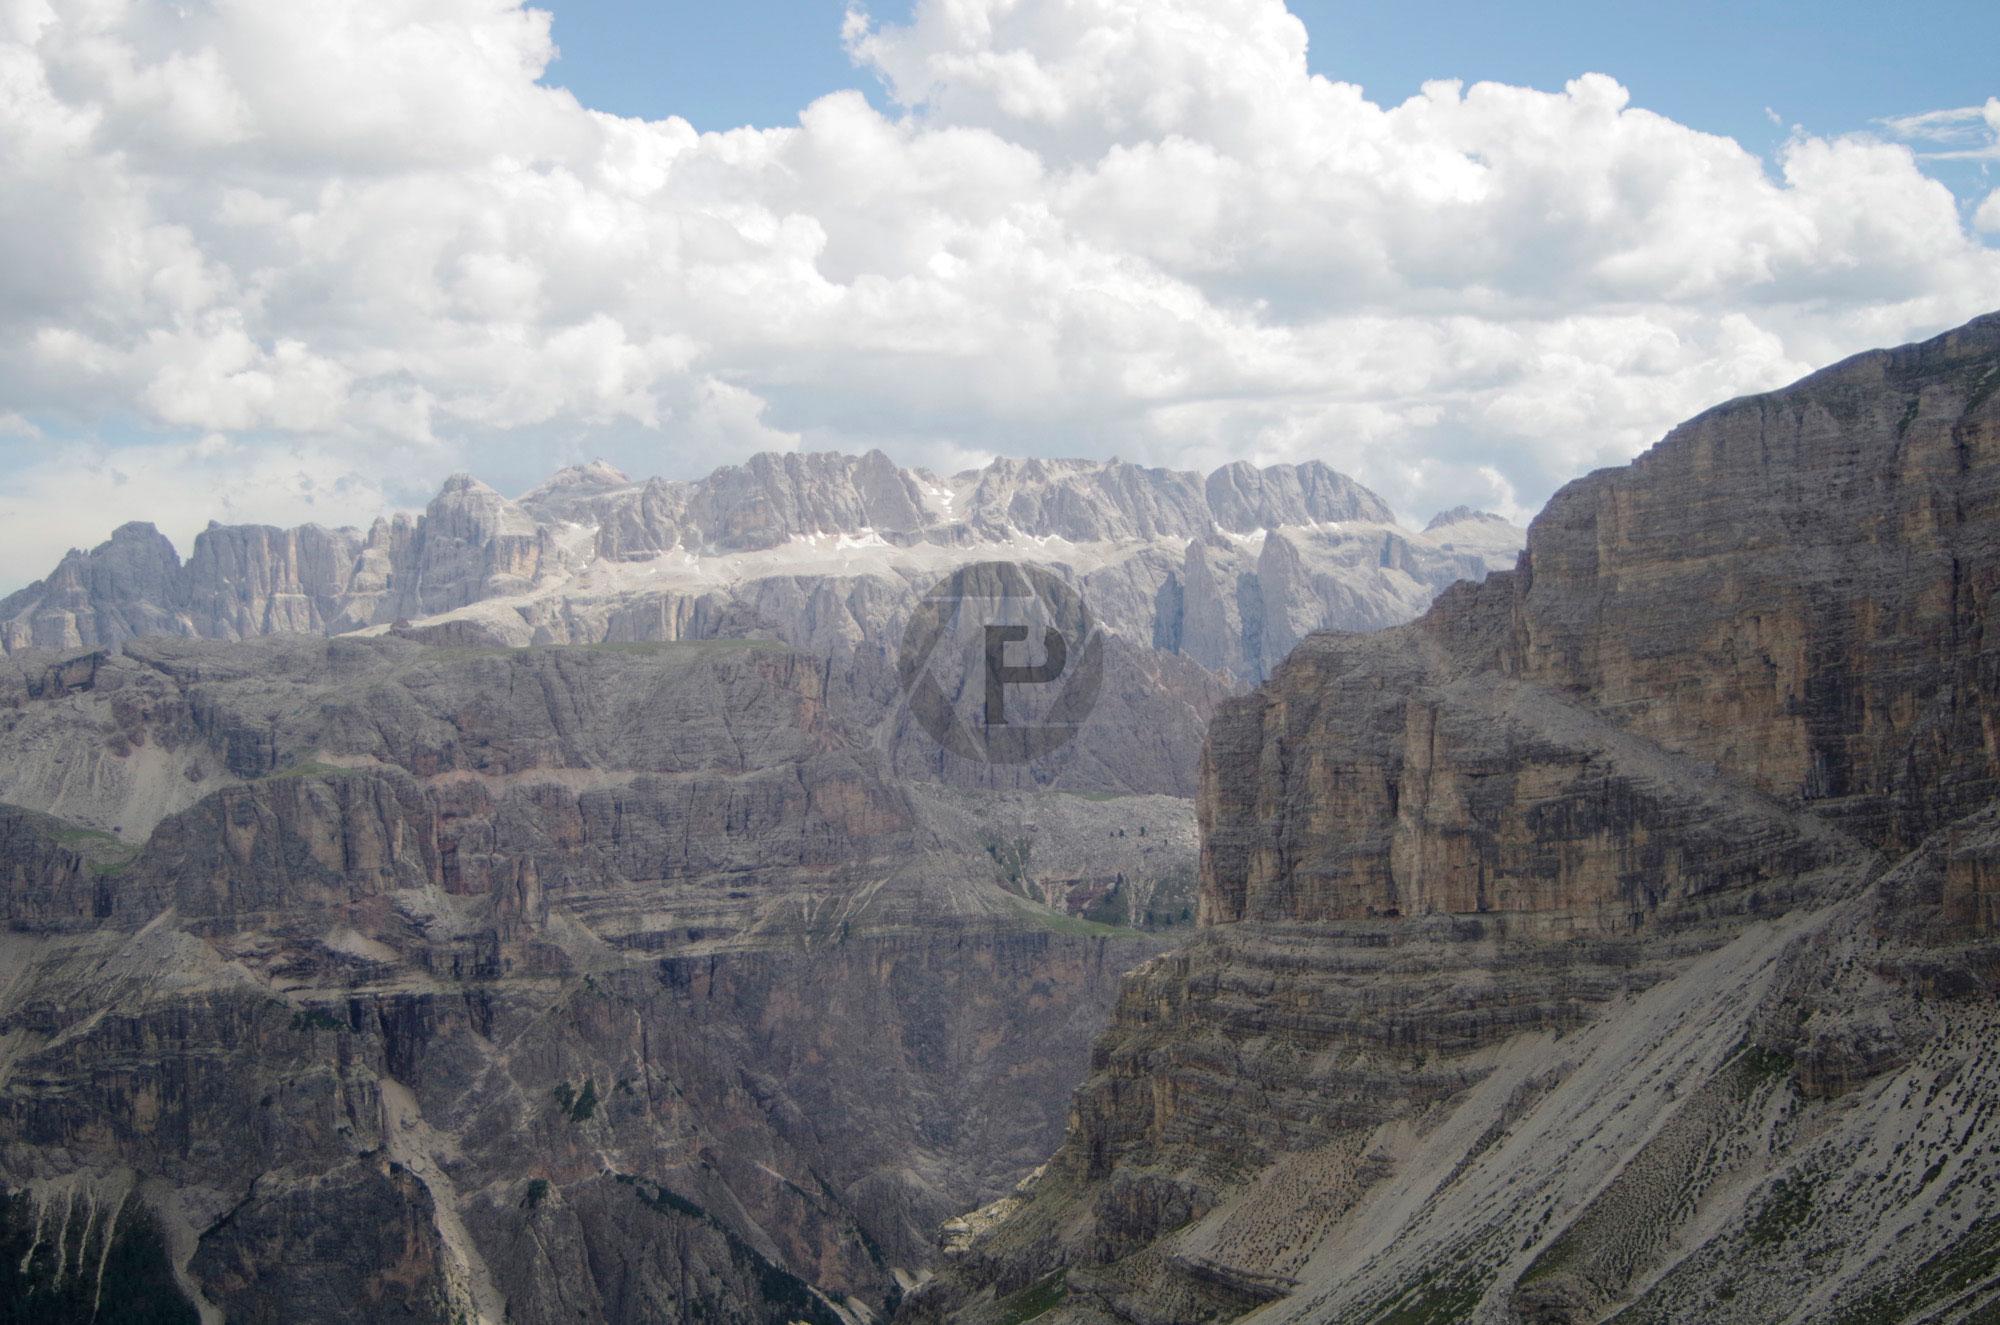 Mount Stevia, Selva and the Dolomiti High Path